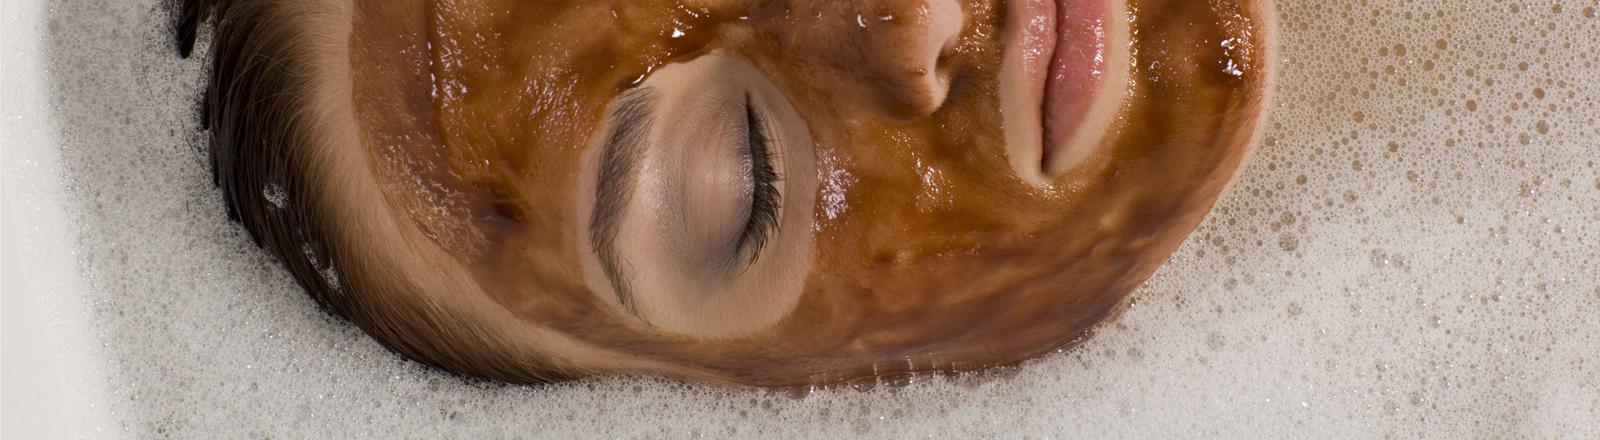 Frau mit Gesichtsmaske in der Wanne